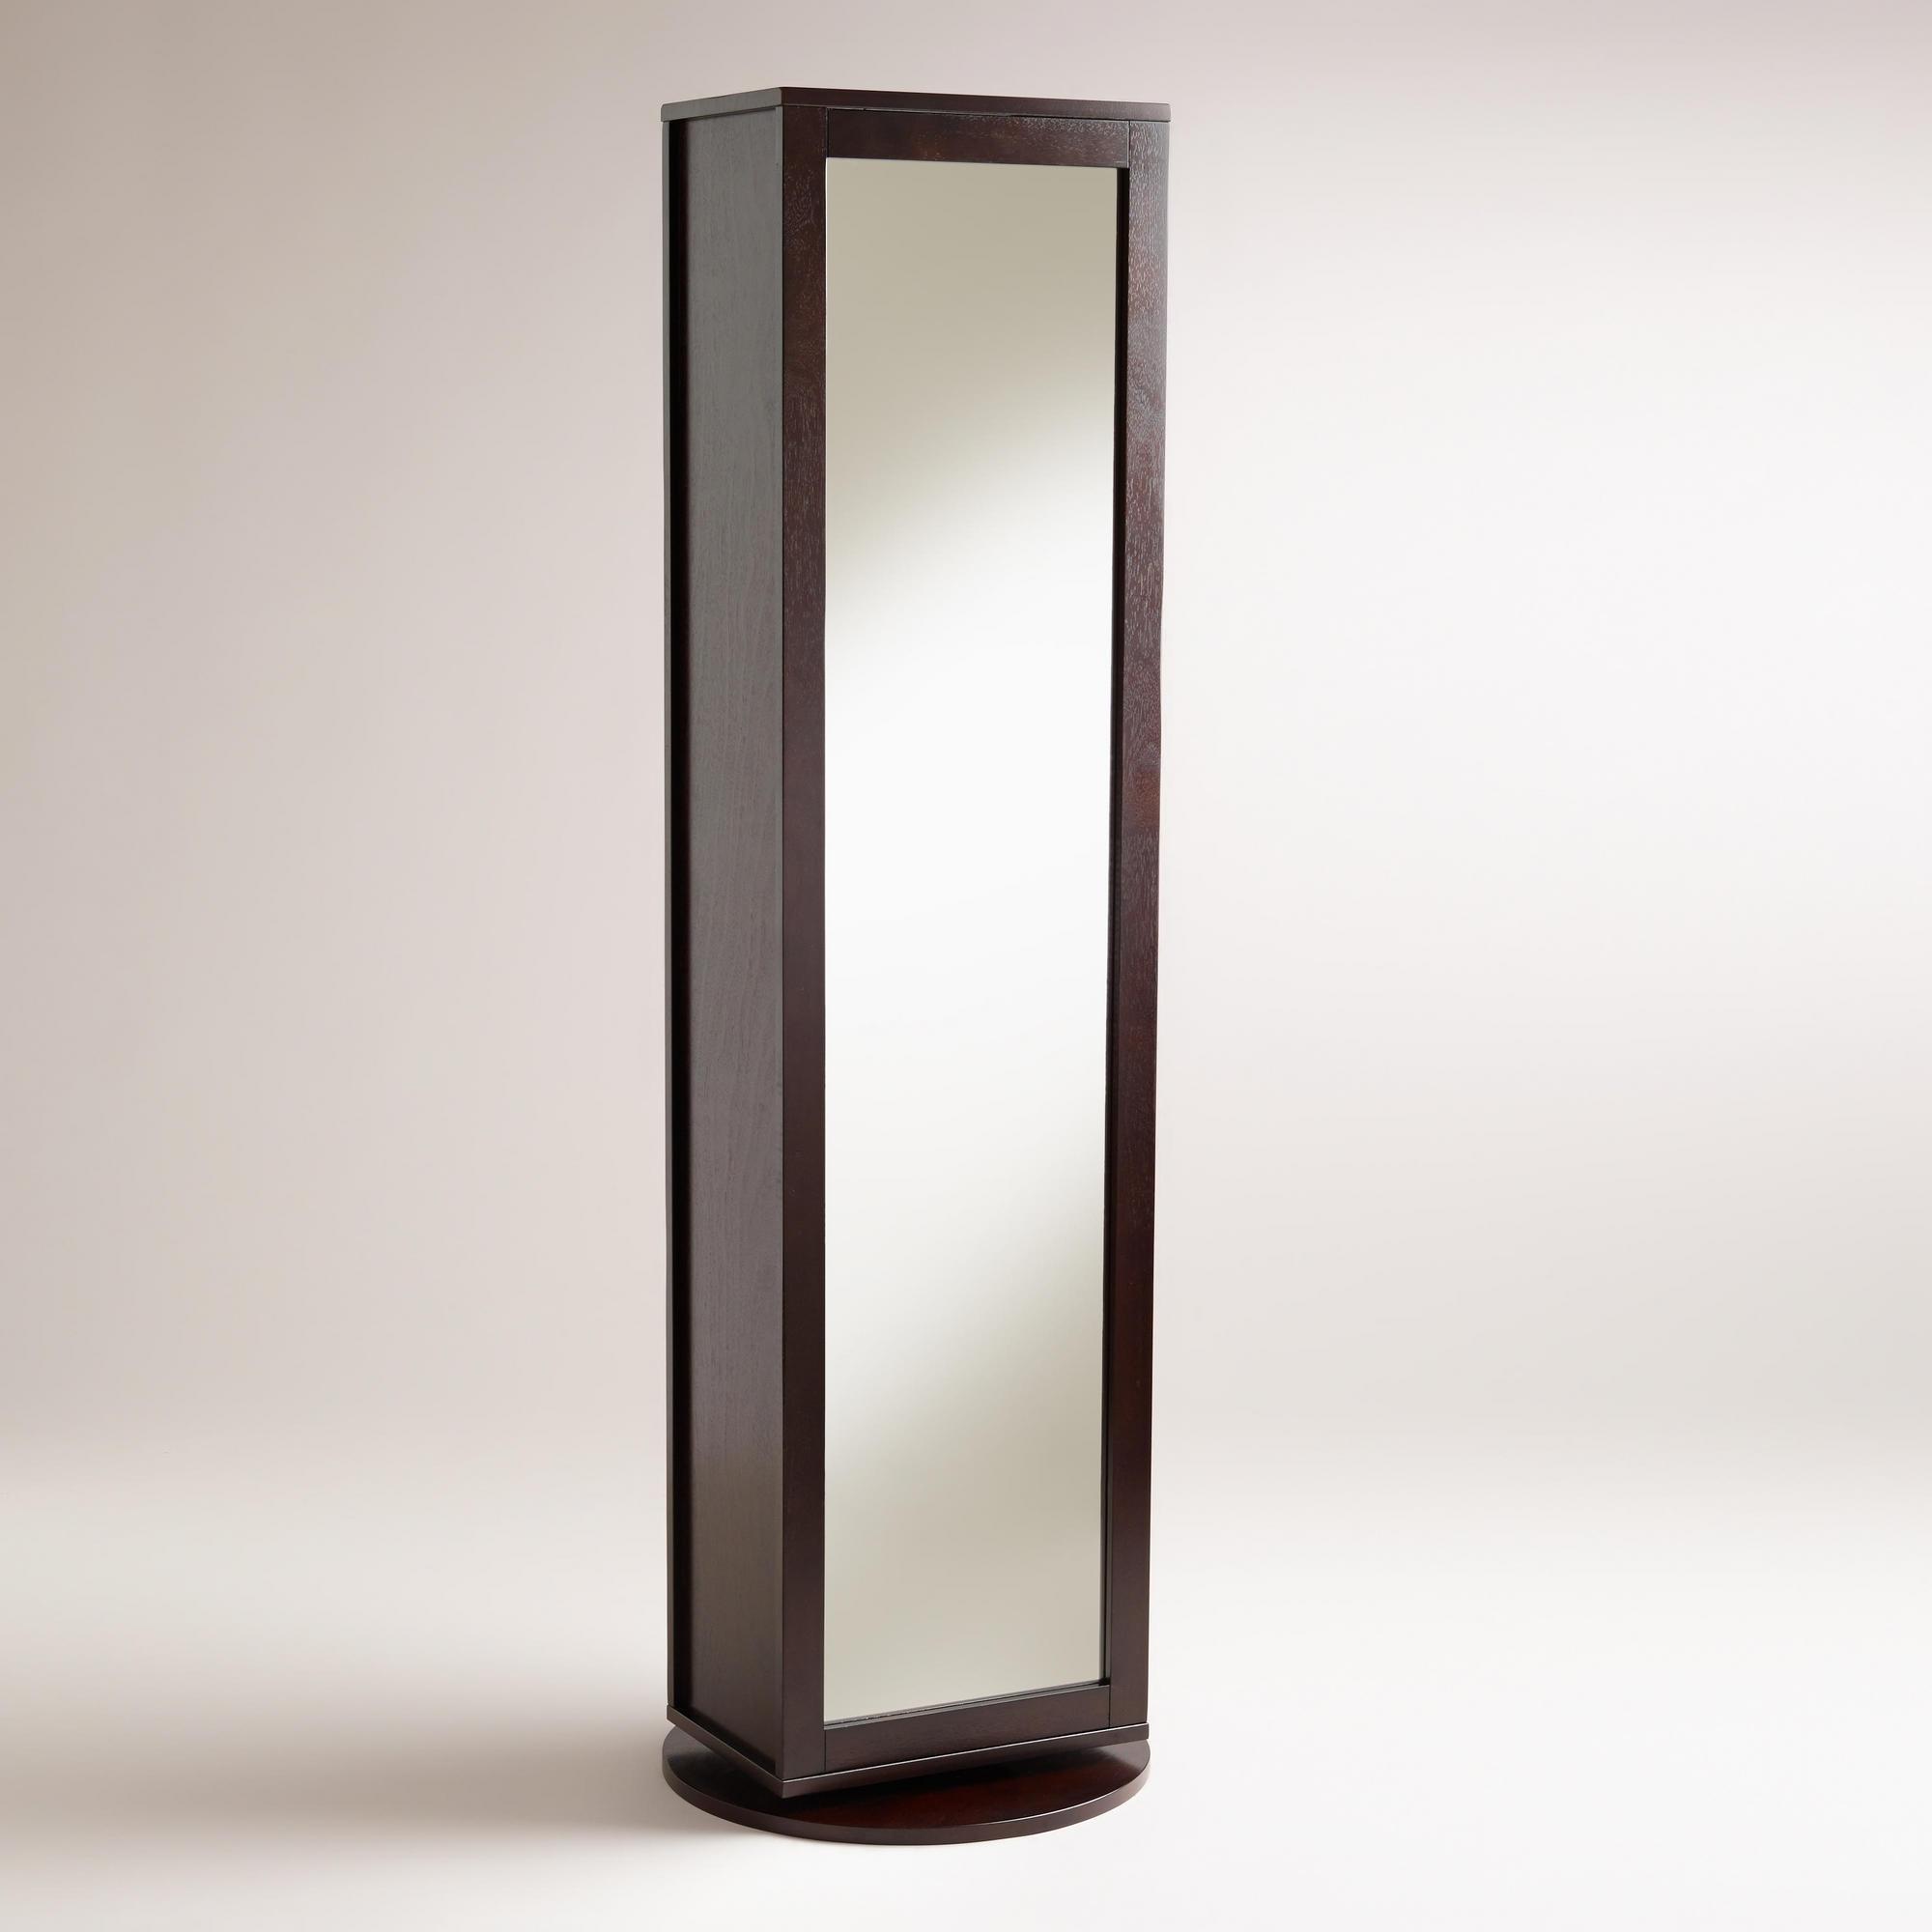 Bathroom Swivel Mirror With Shelves